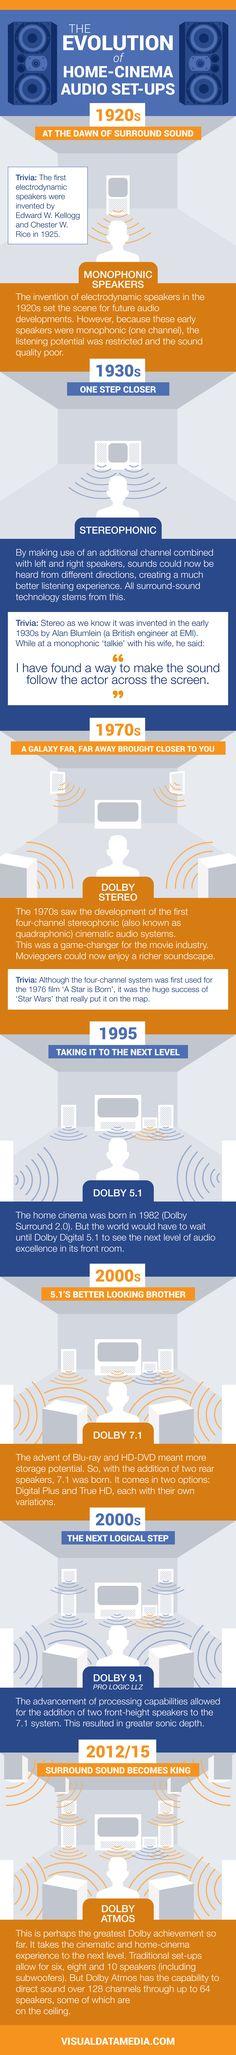 The Evolution of Home-Cinema Audio Set-ups #Infographic #Entertainment #Technology